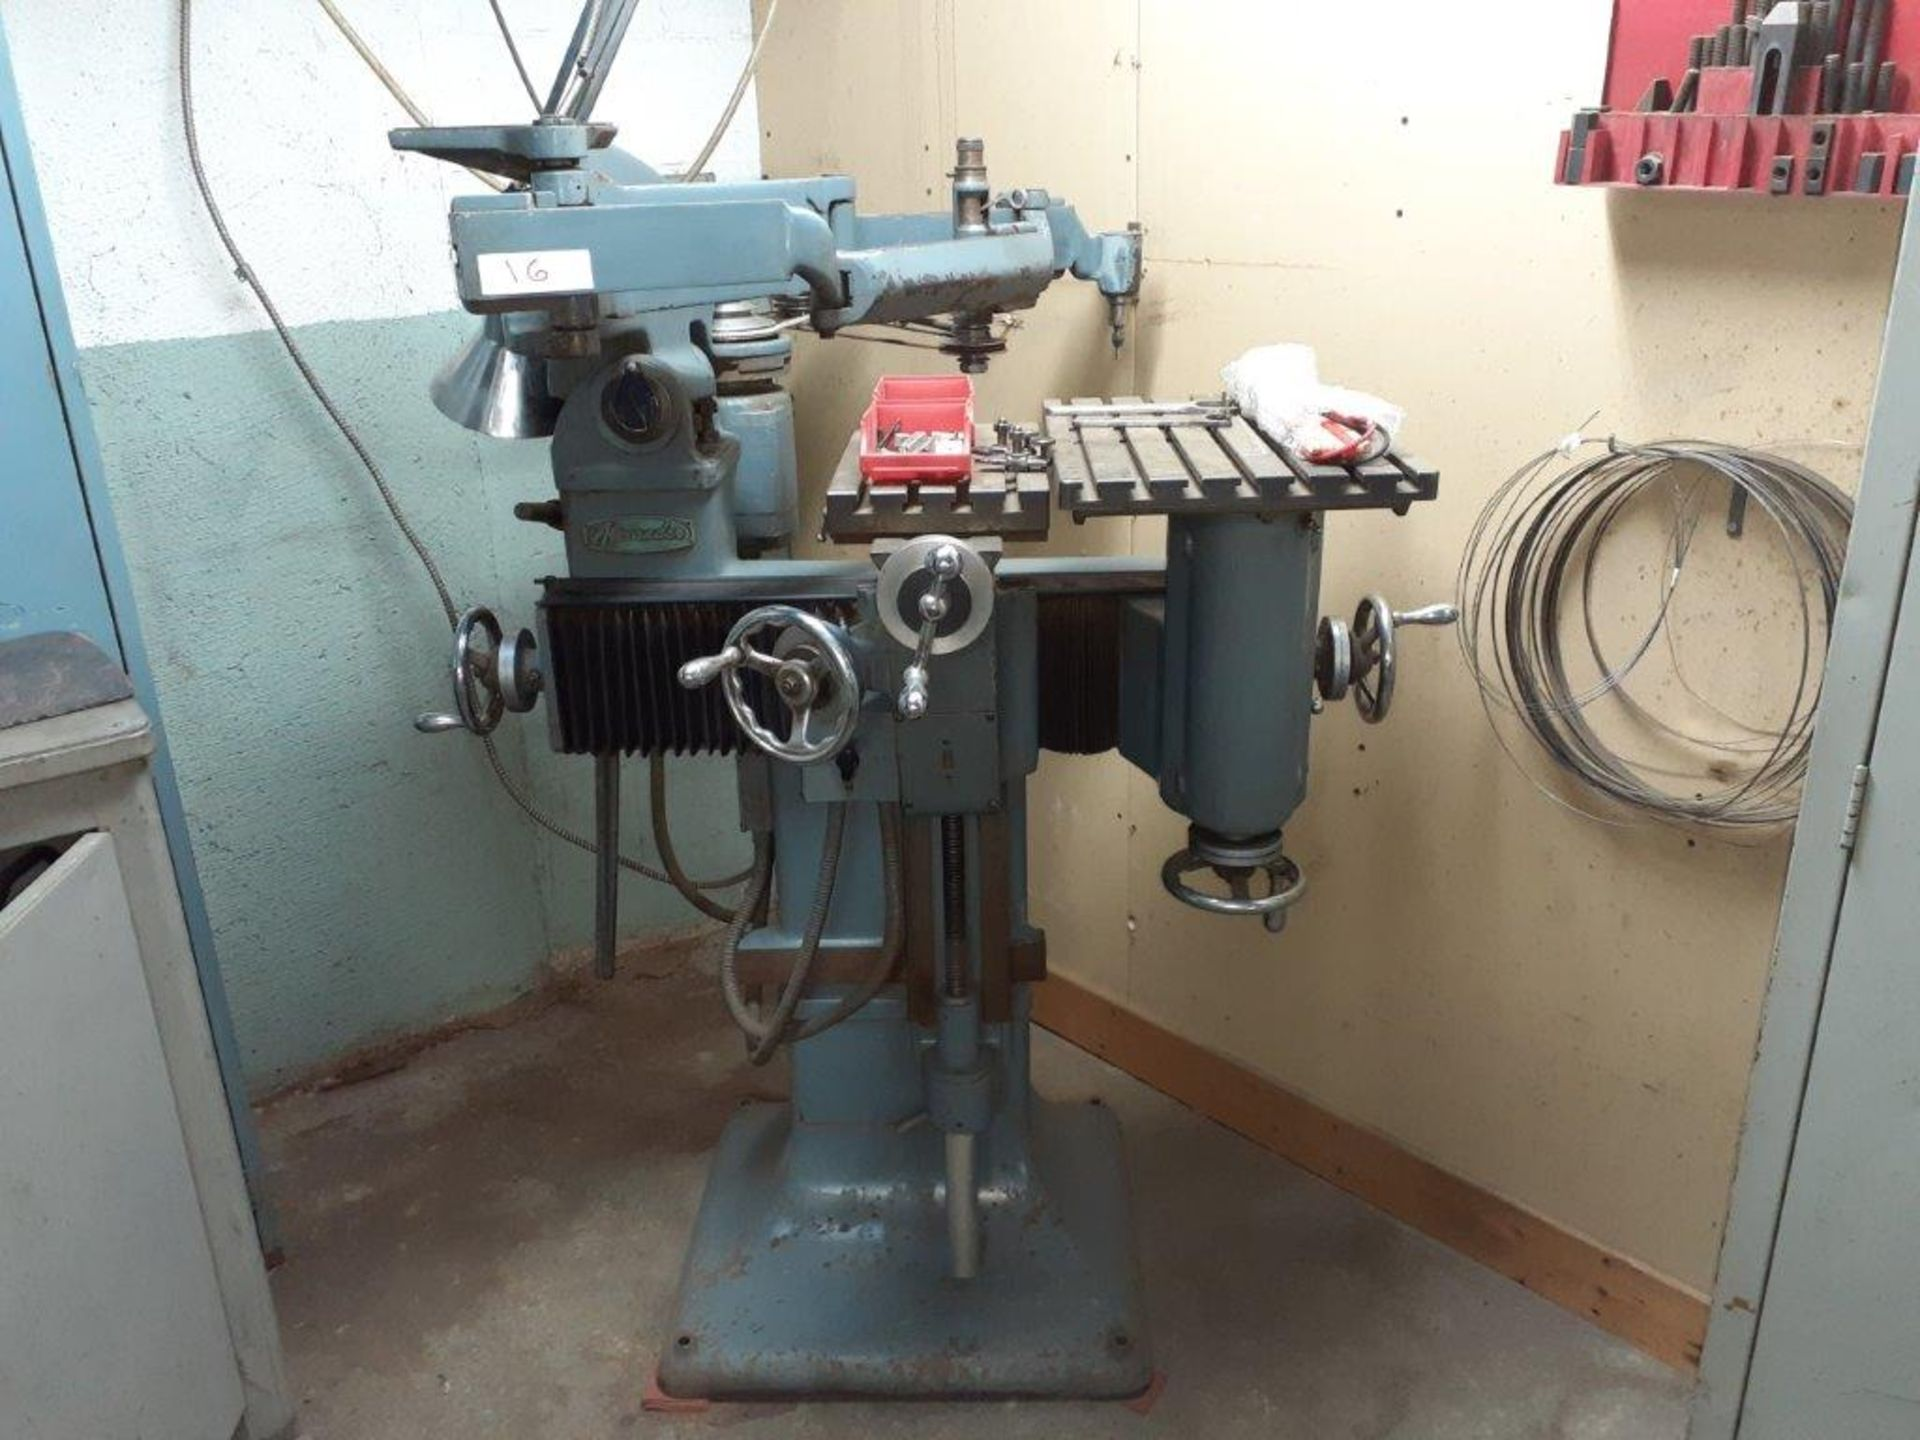 ALEXANDER PENTAGRAPH Machine, mod: 3A, c/w Metal Cabinet & Assorted Parts - Image 2 of 8